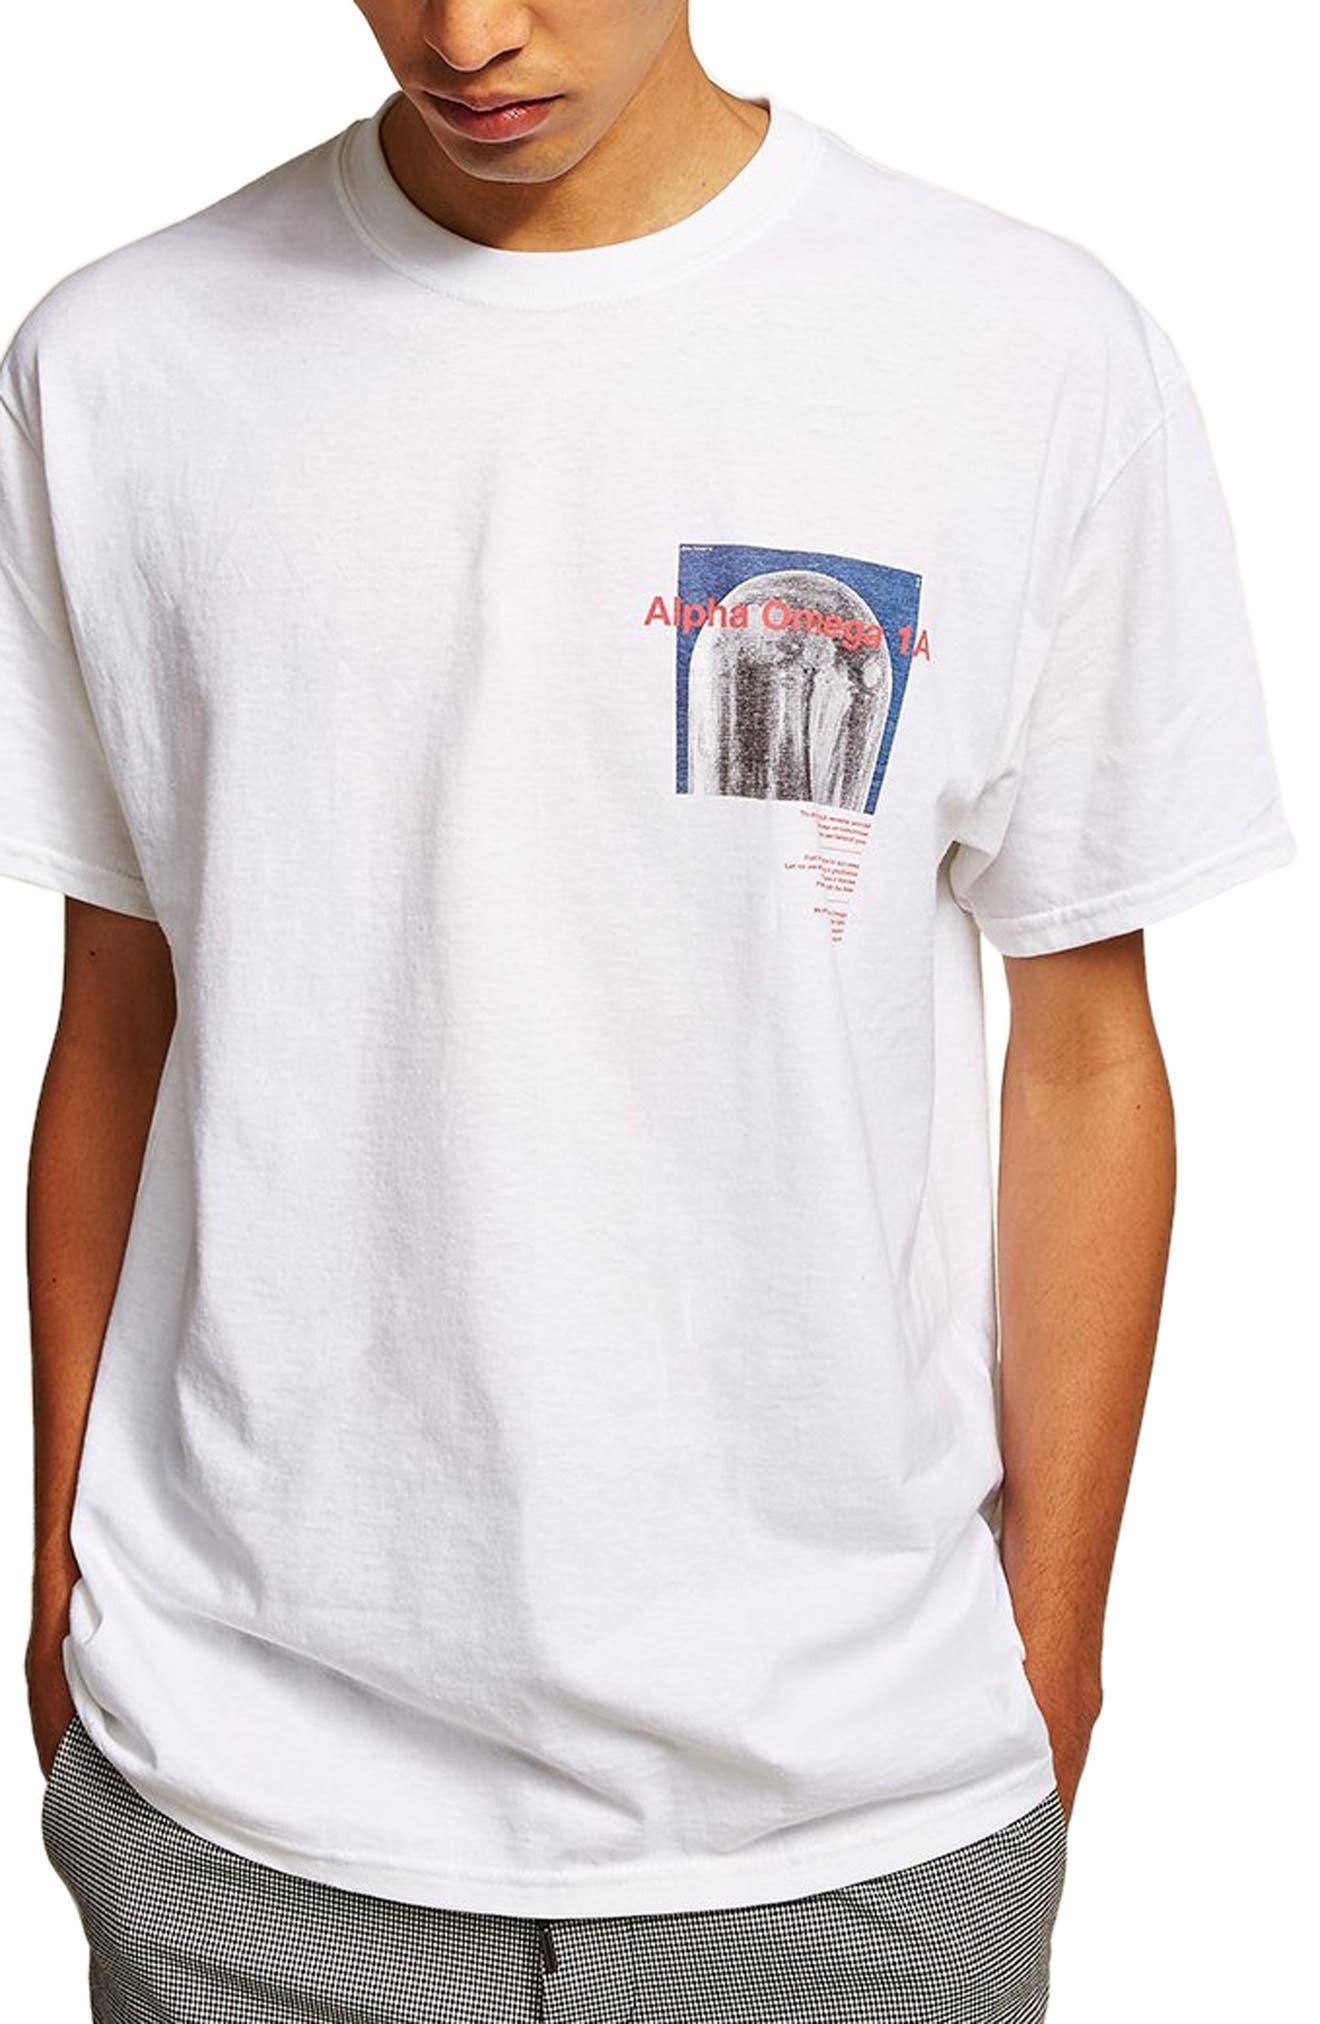 Moon Graphic T-Shirt,                             Main thumbnail 1, color,                             WHITE MULTI